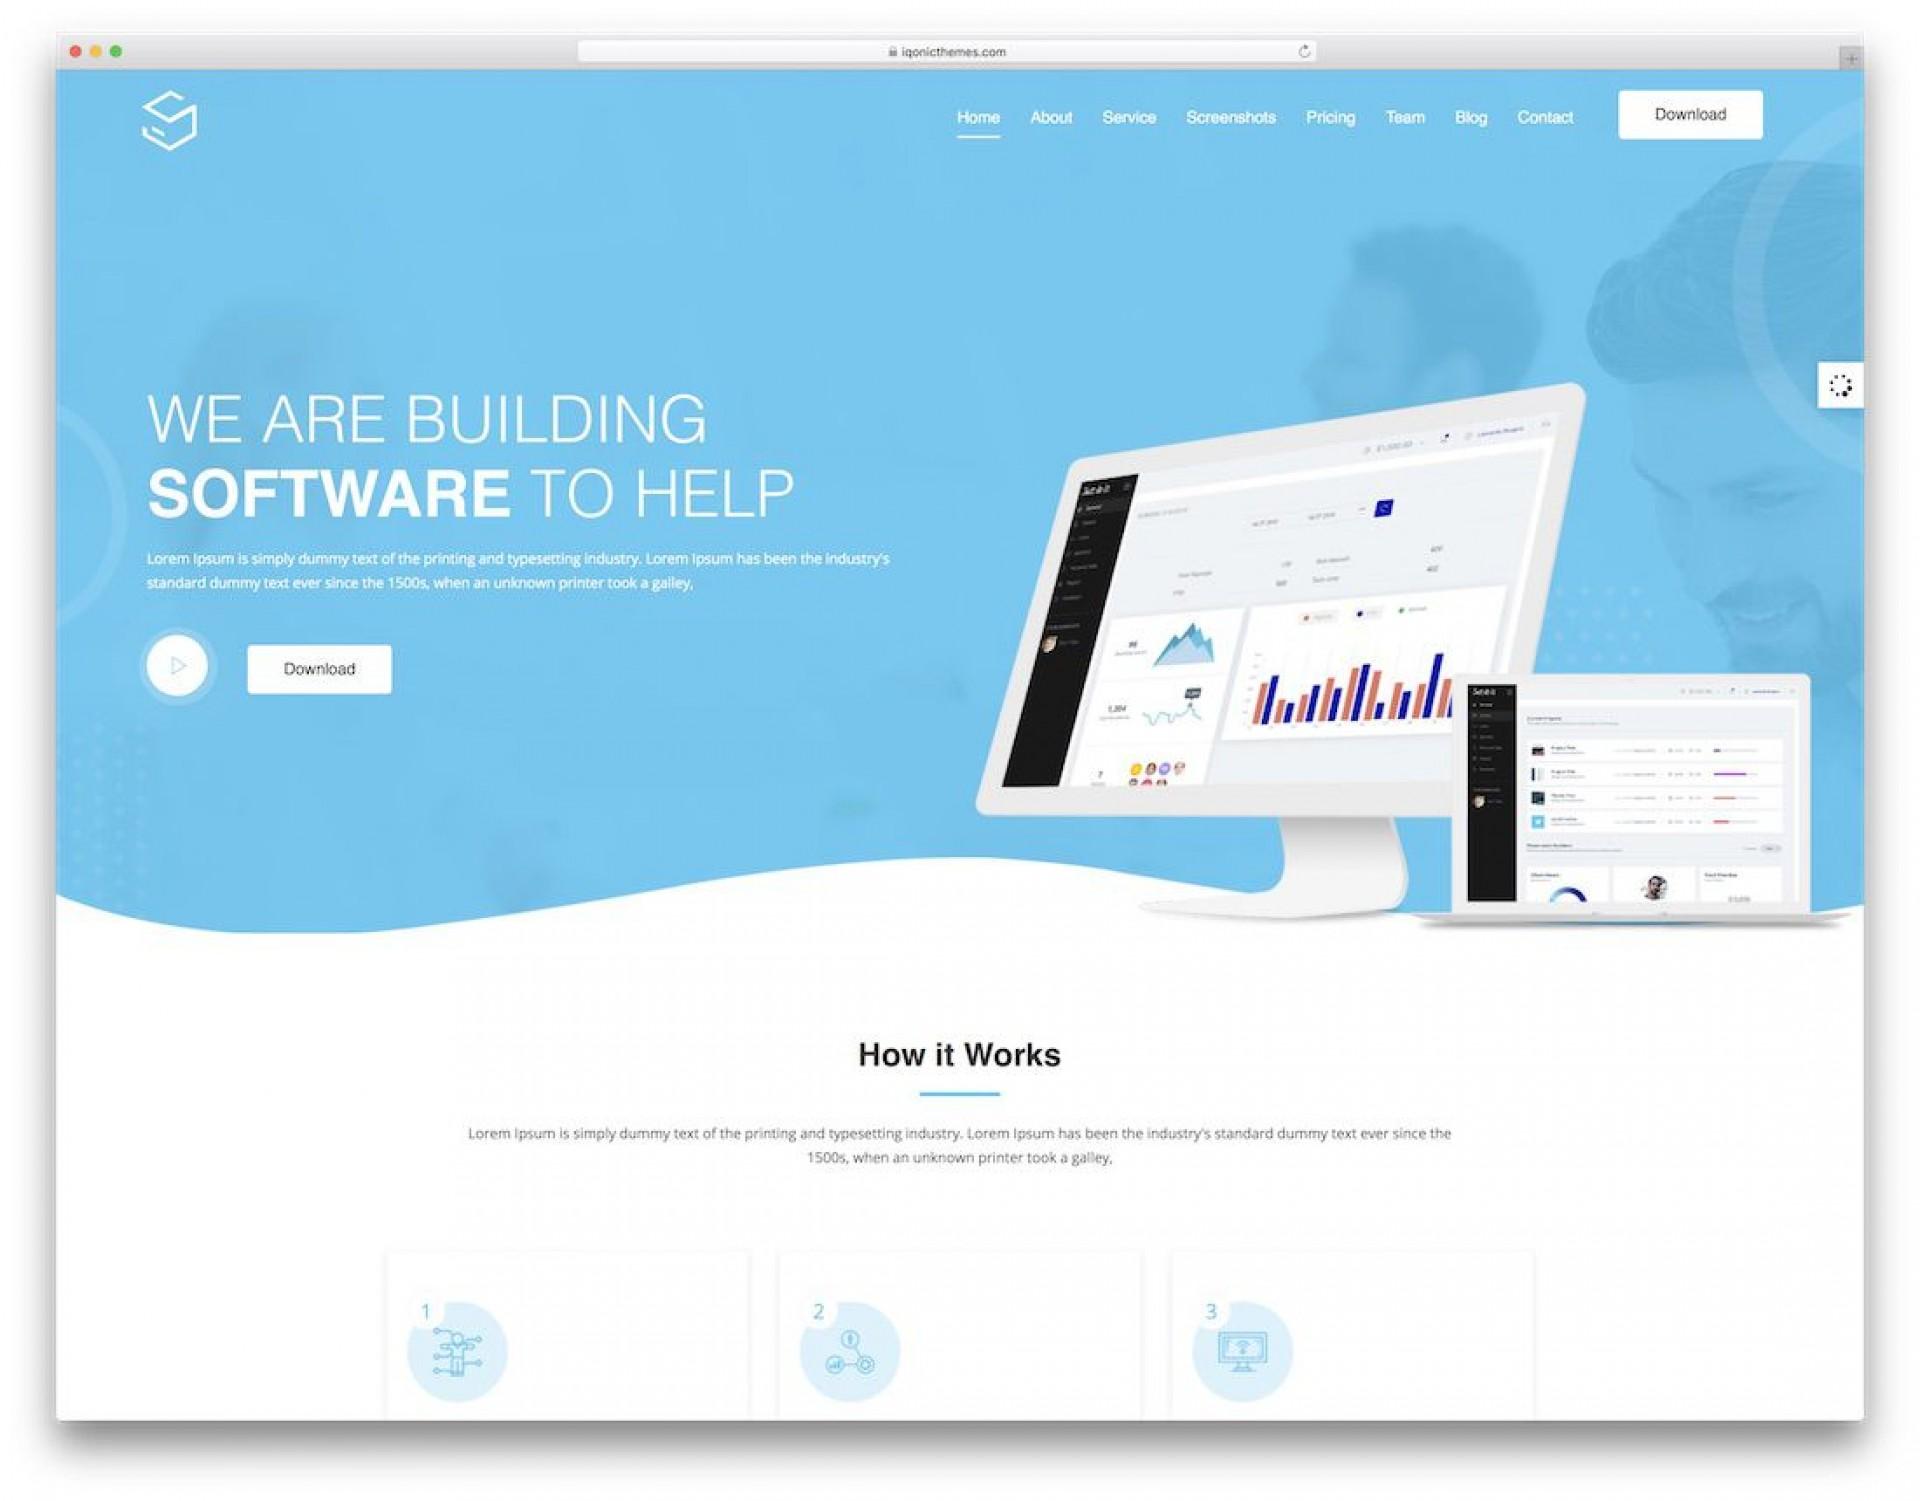 008 Striking Free Professional Web Design Template High Def  Templates Website Download1920